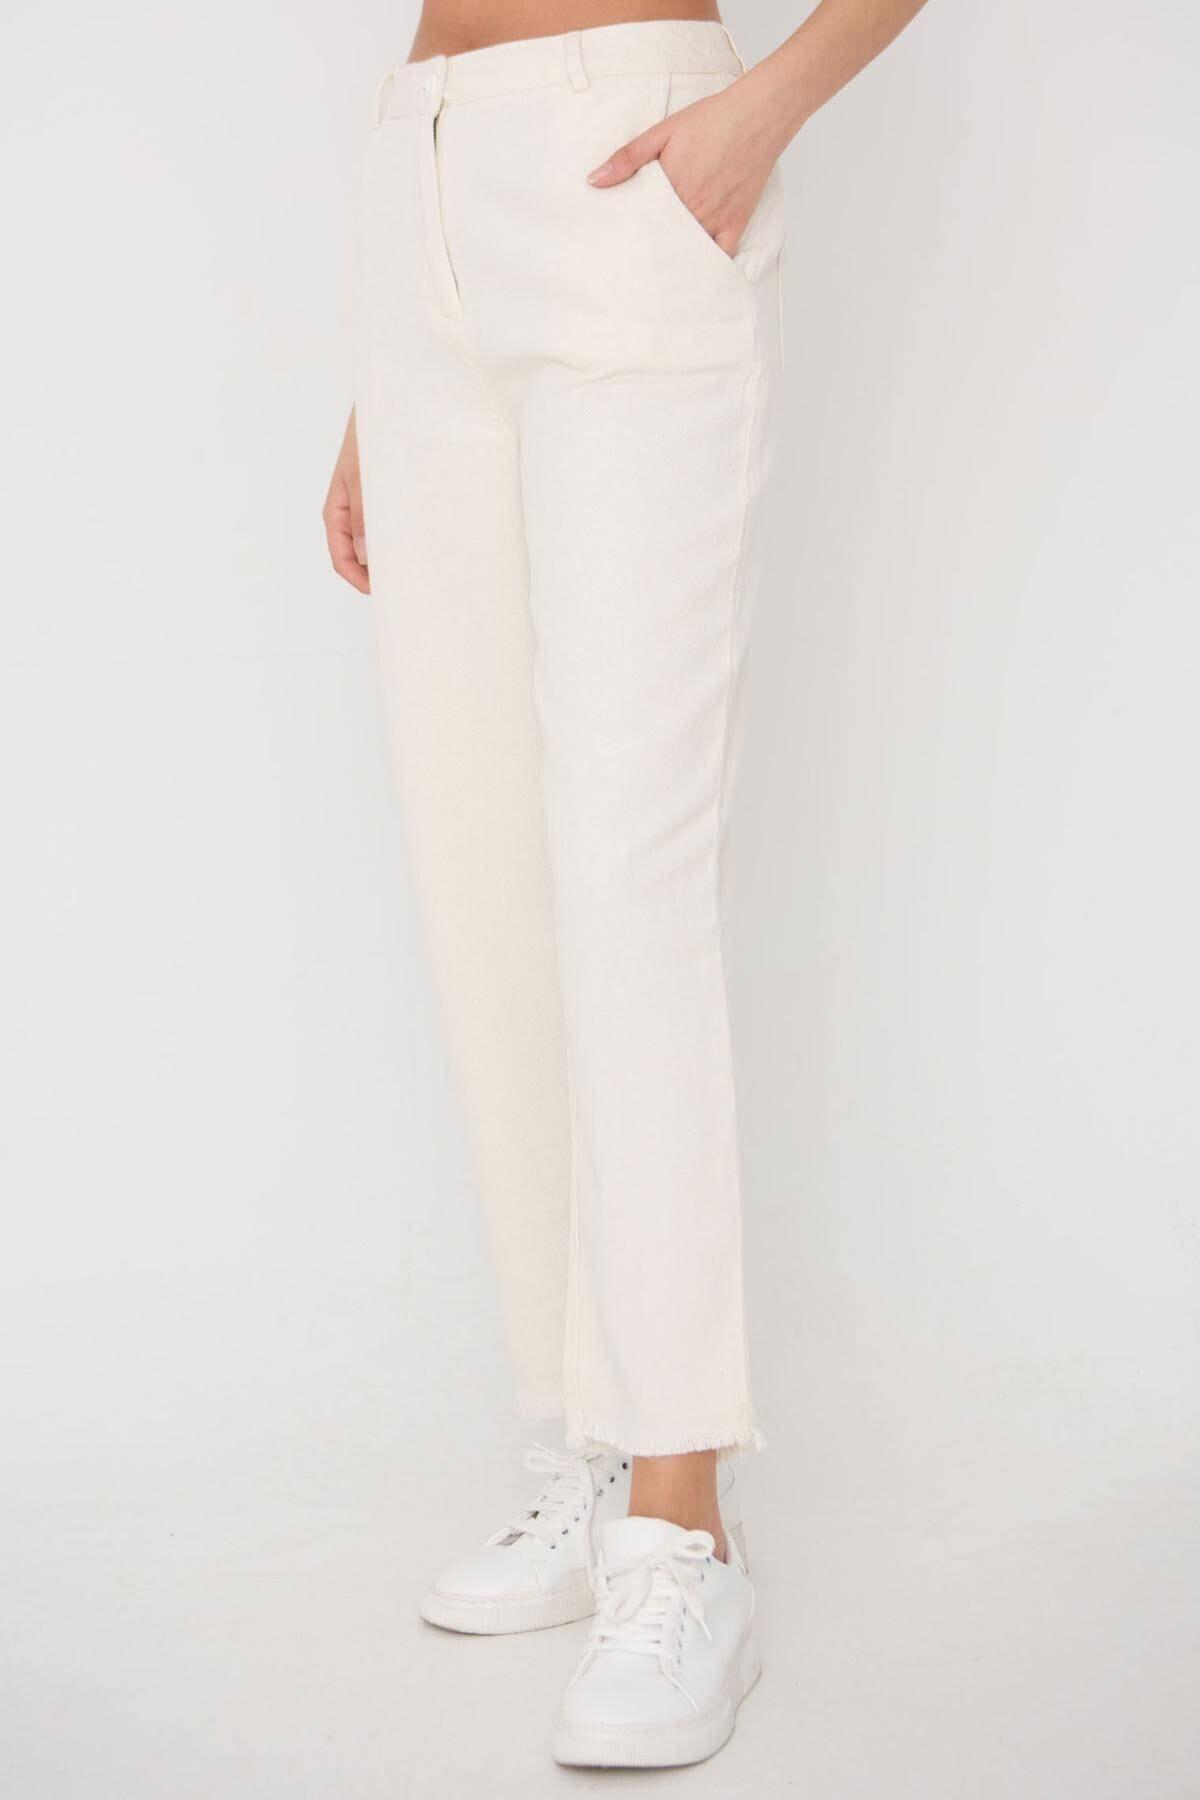 Addax Kadın Ham Paça Detaylı Pantolon Pn11-0049 - K8 Adx-0000023876 1